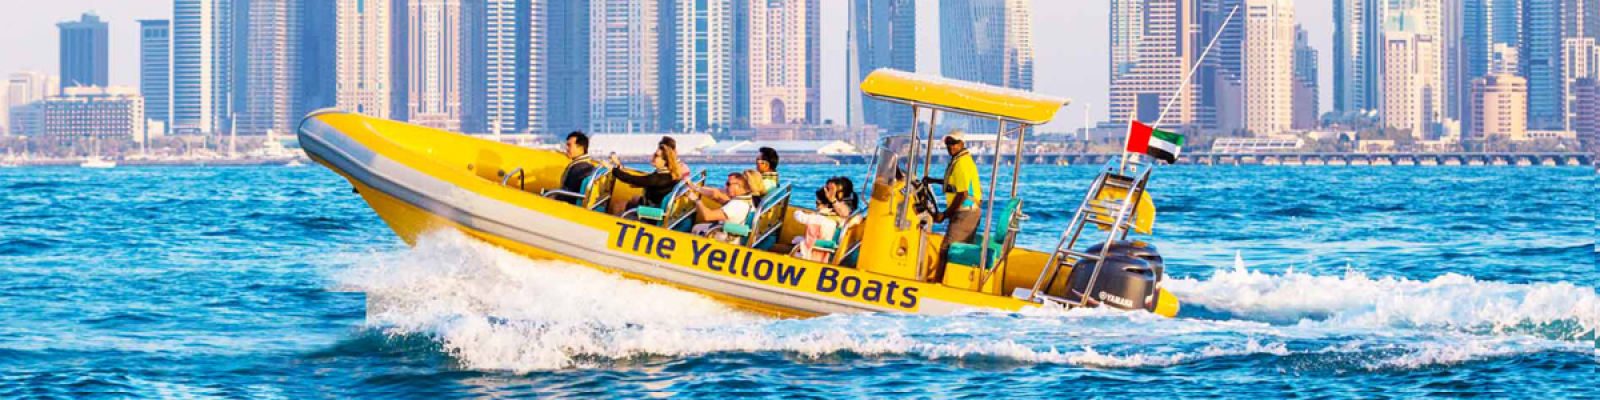 yellow boat tour dubai, yellow boat tour dubai marina, yellow boat ride dubai